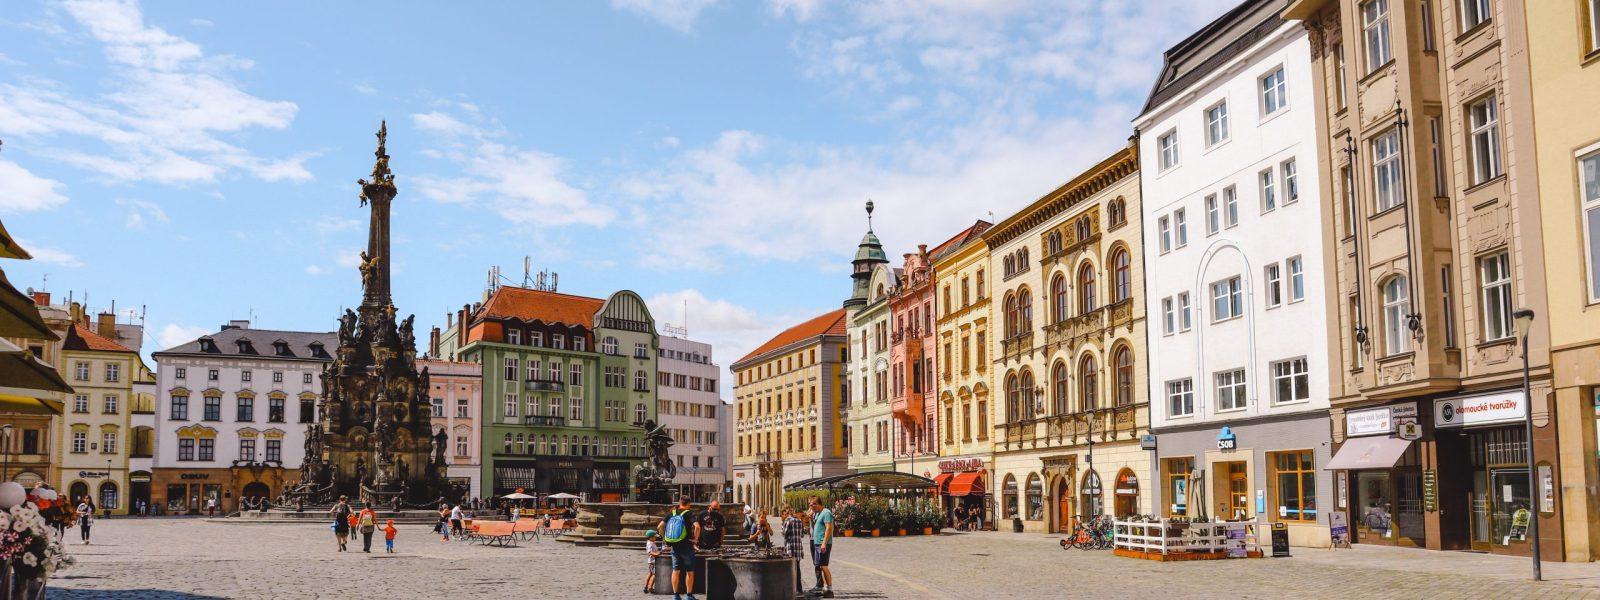 Olomouc in Tsjechië, het kleine Praag van Moravië